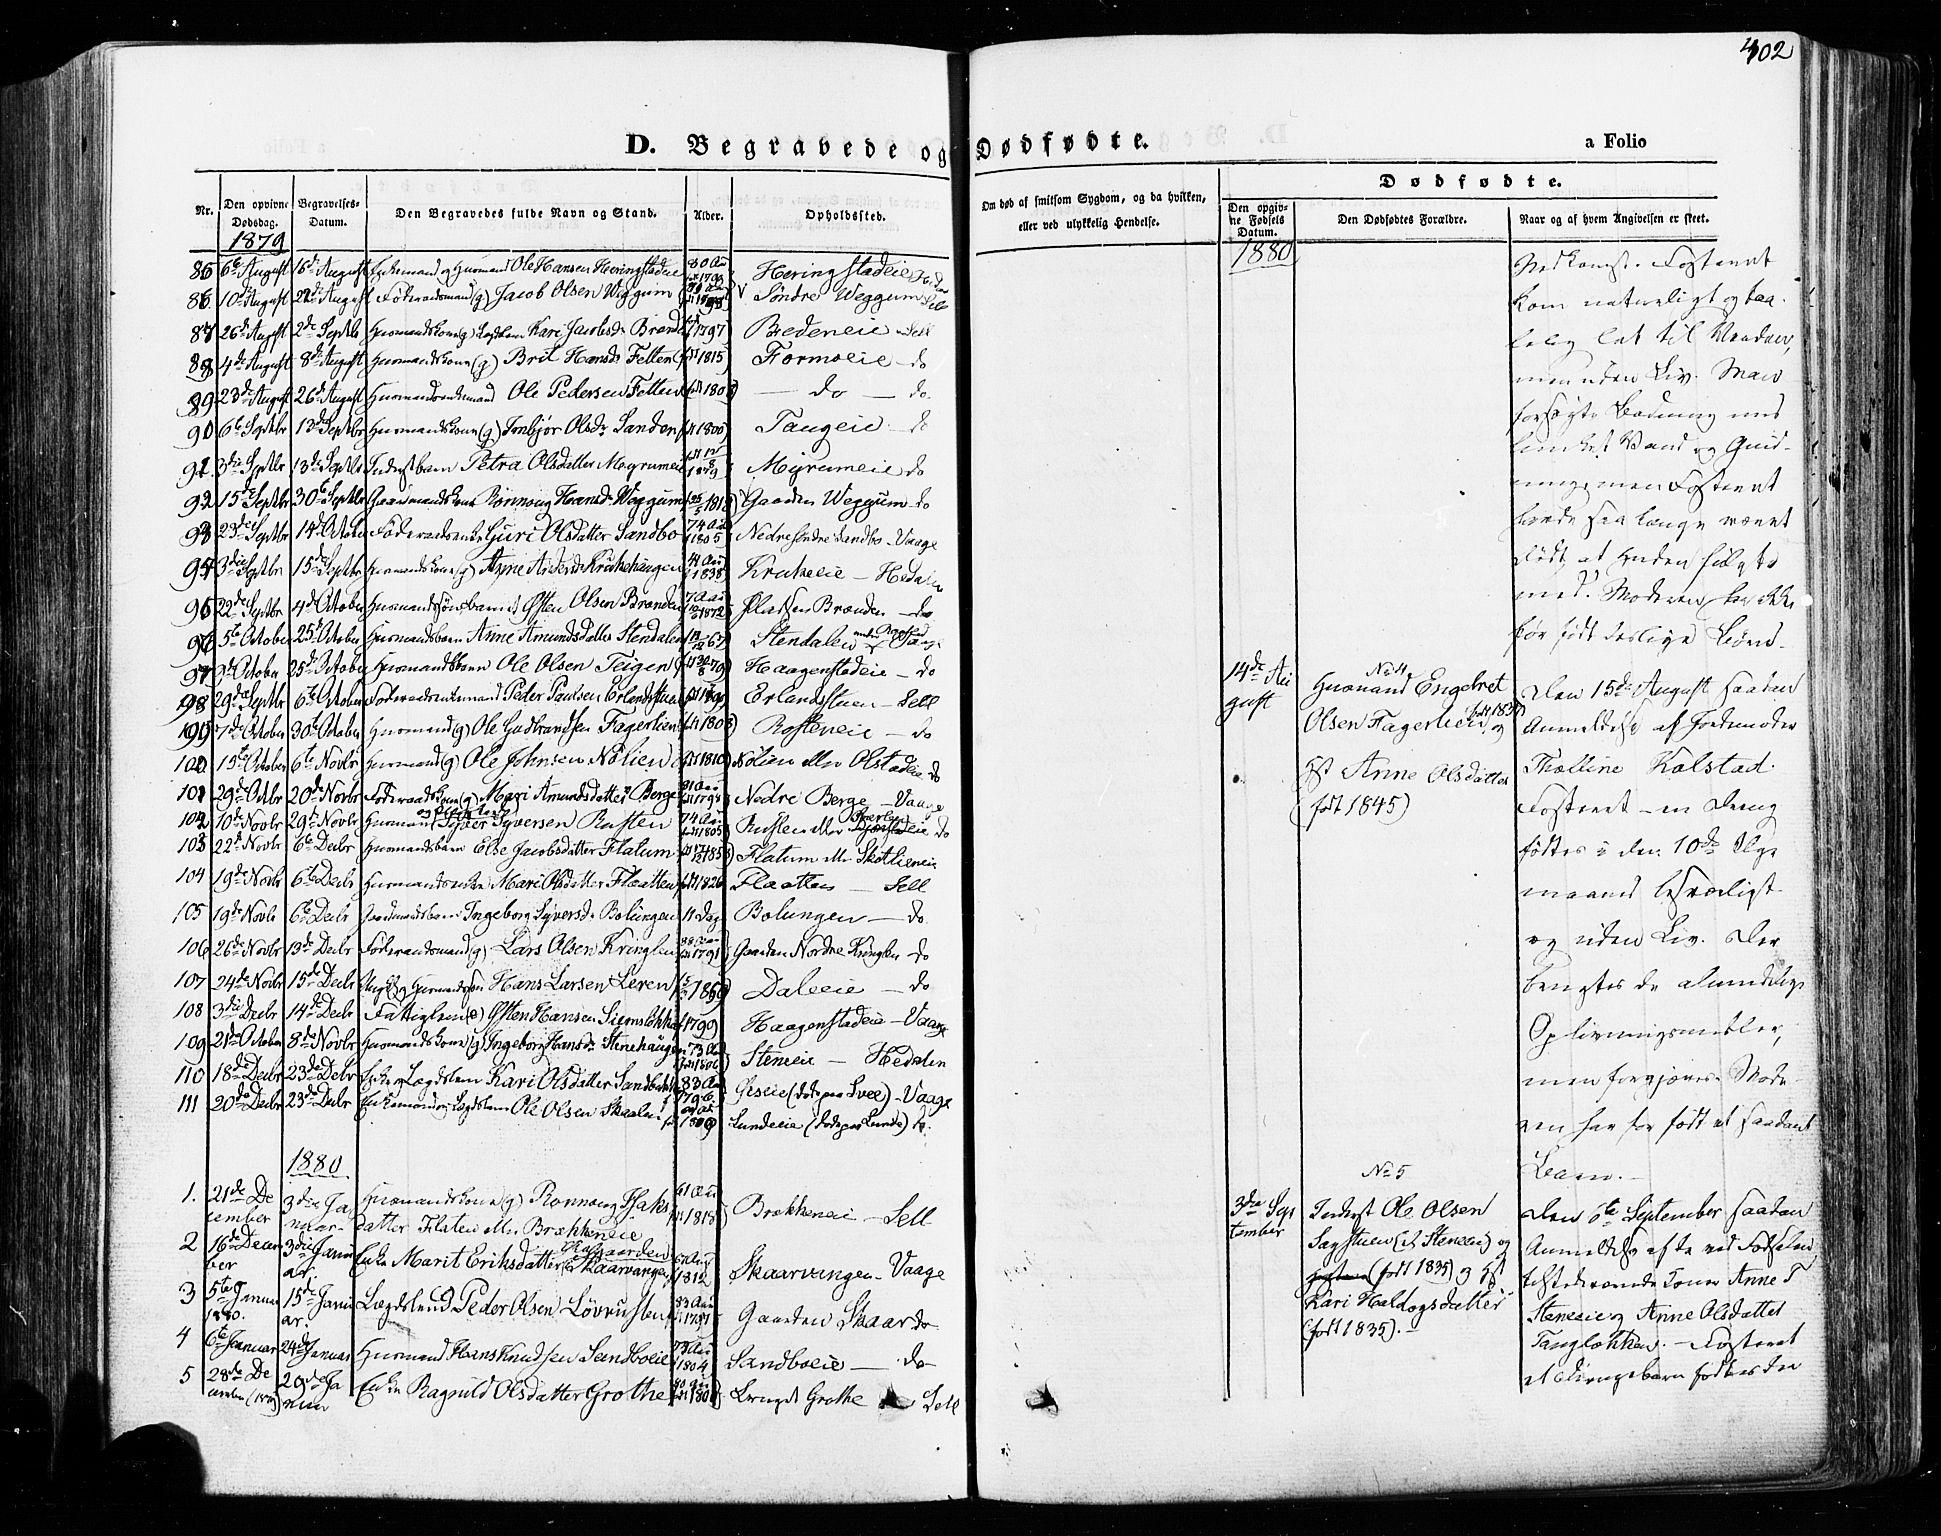 SAH, Vågå prestekontor, Ministerialbok nr. 7 /1, 1872-1886, s. 402